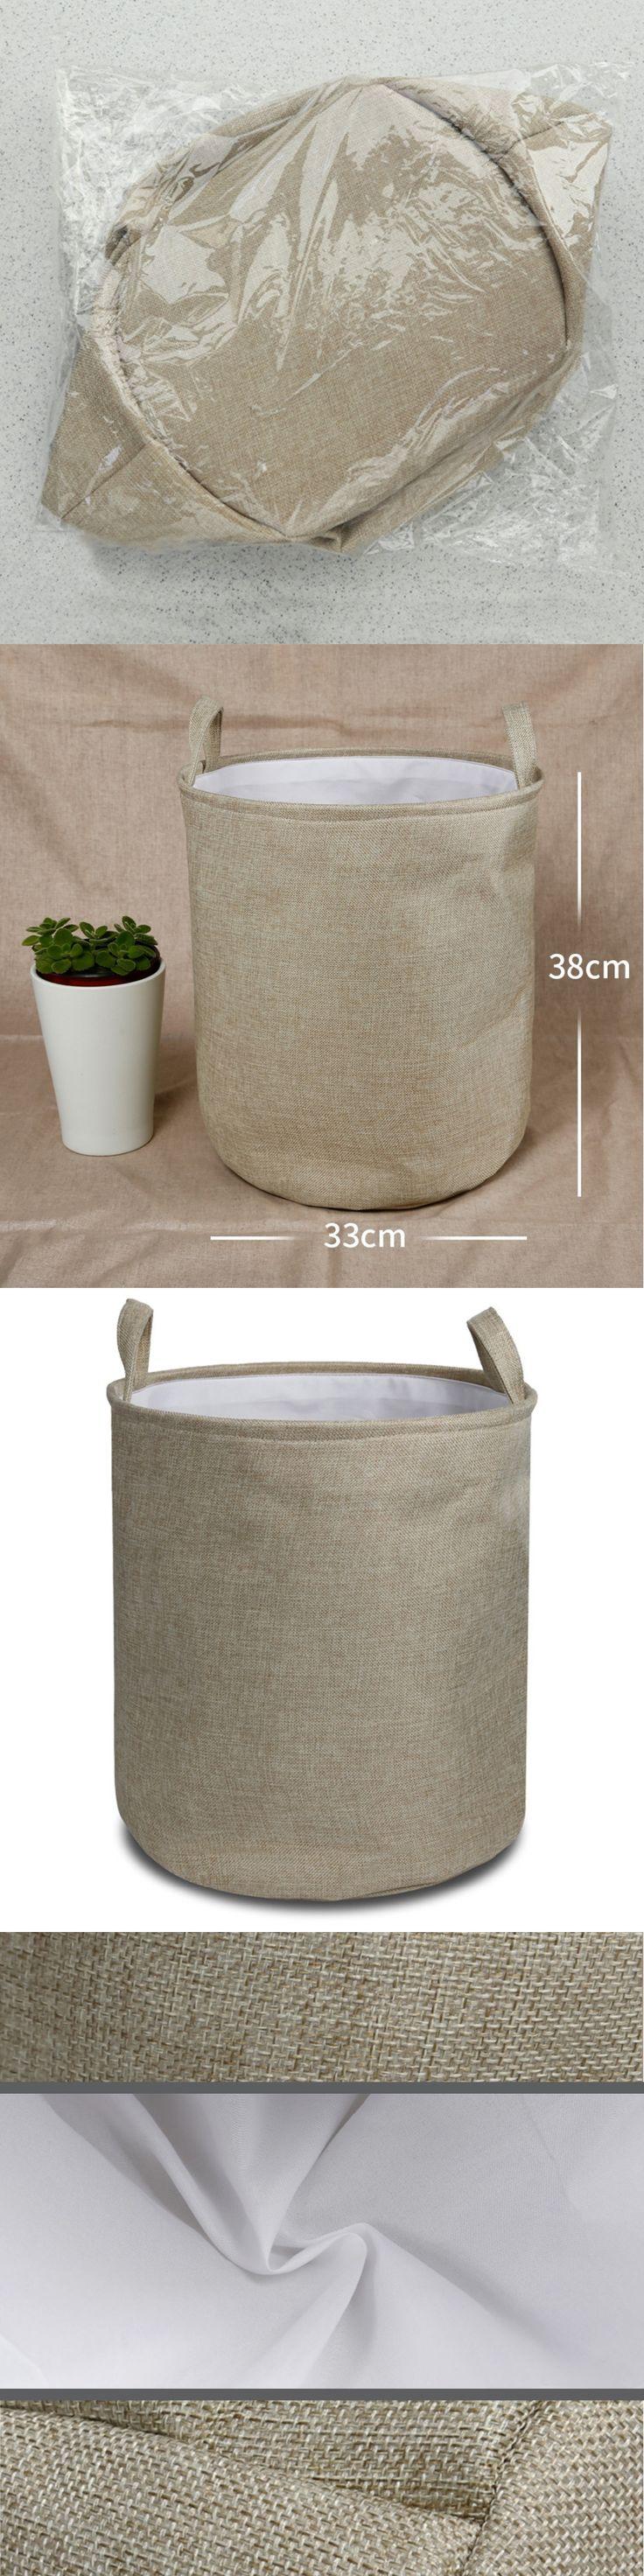 Giftgarden Large Laundry Basket 80% cotton with PE Waterproof Folding Washing Bin Lightweight Sturdy Toy Storage